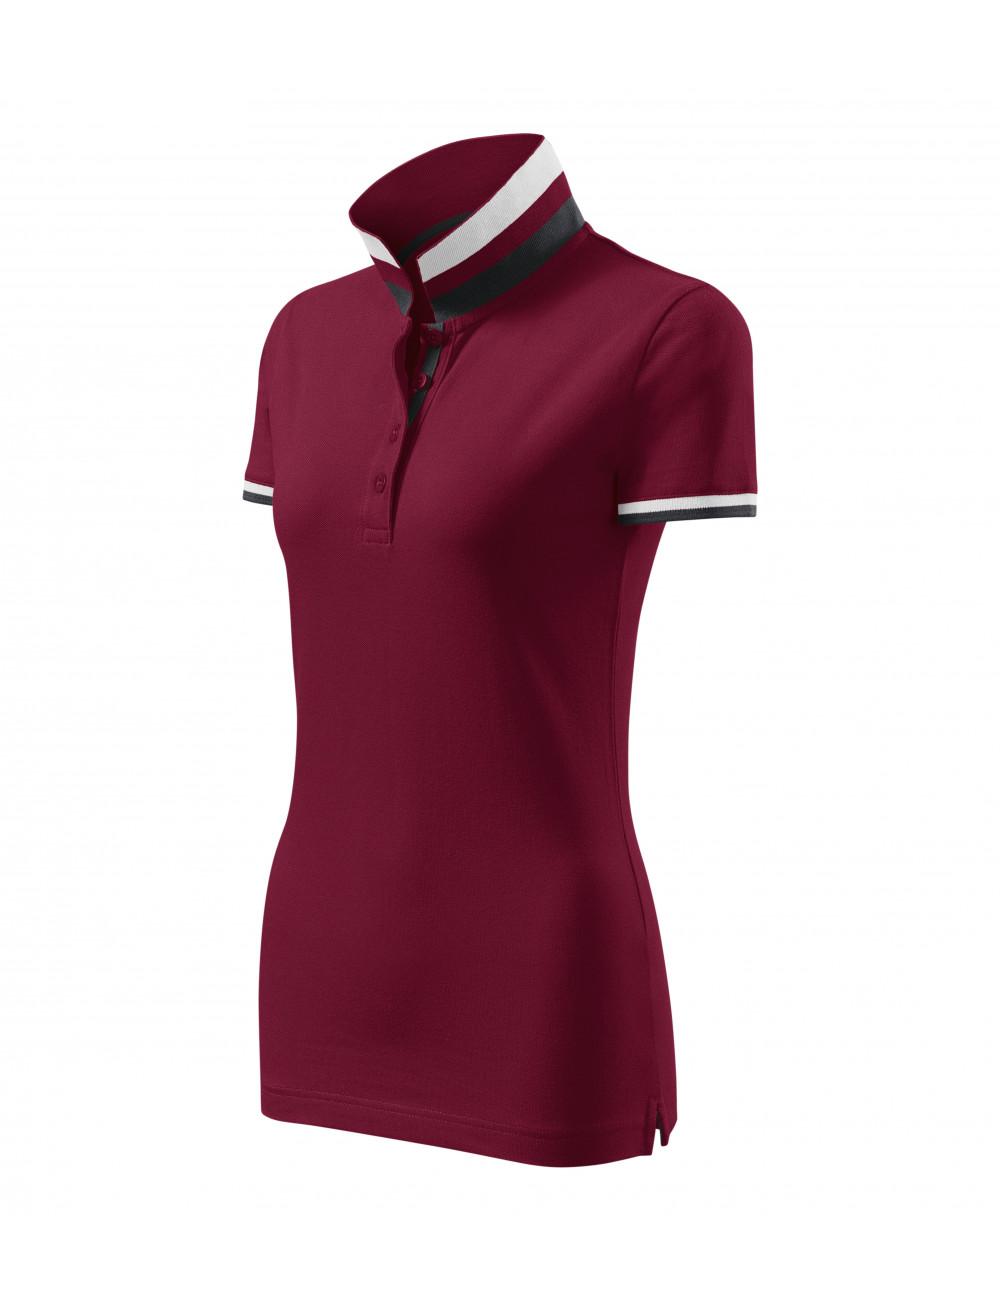 Adler MALFINIPREMIUM Koszulka polo damska Collar Up 257 garnet